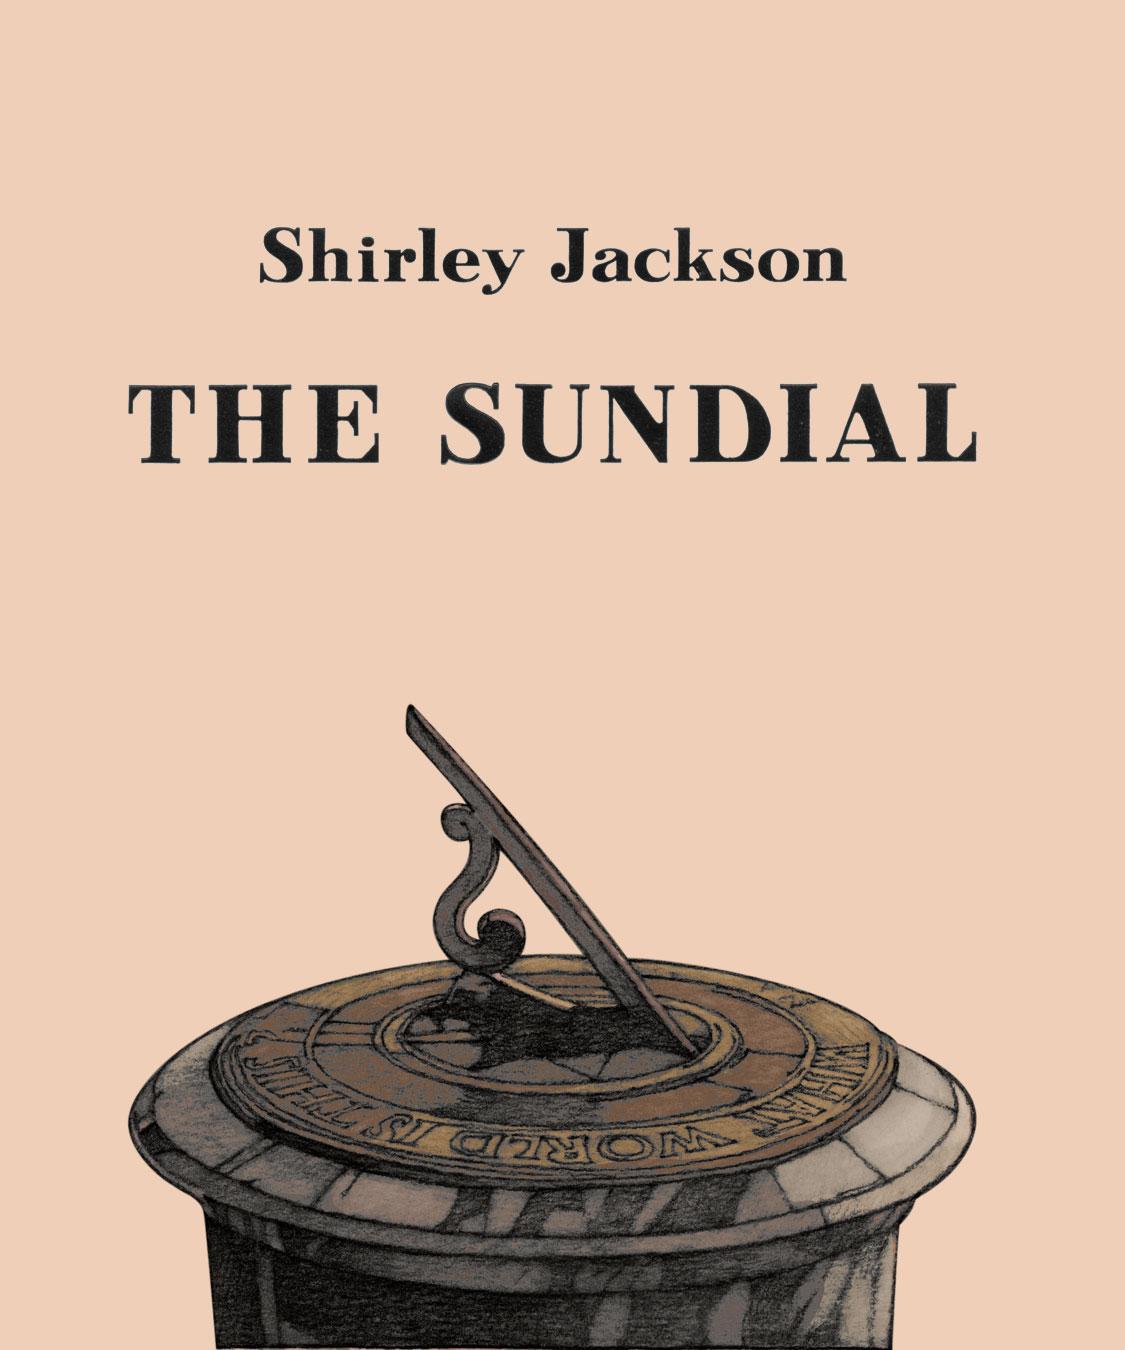 Sundial-Label.300-dpi.RGB.jpg